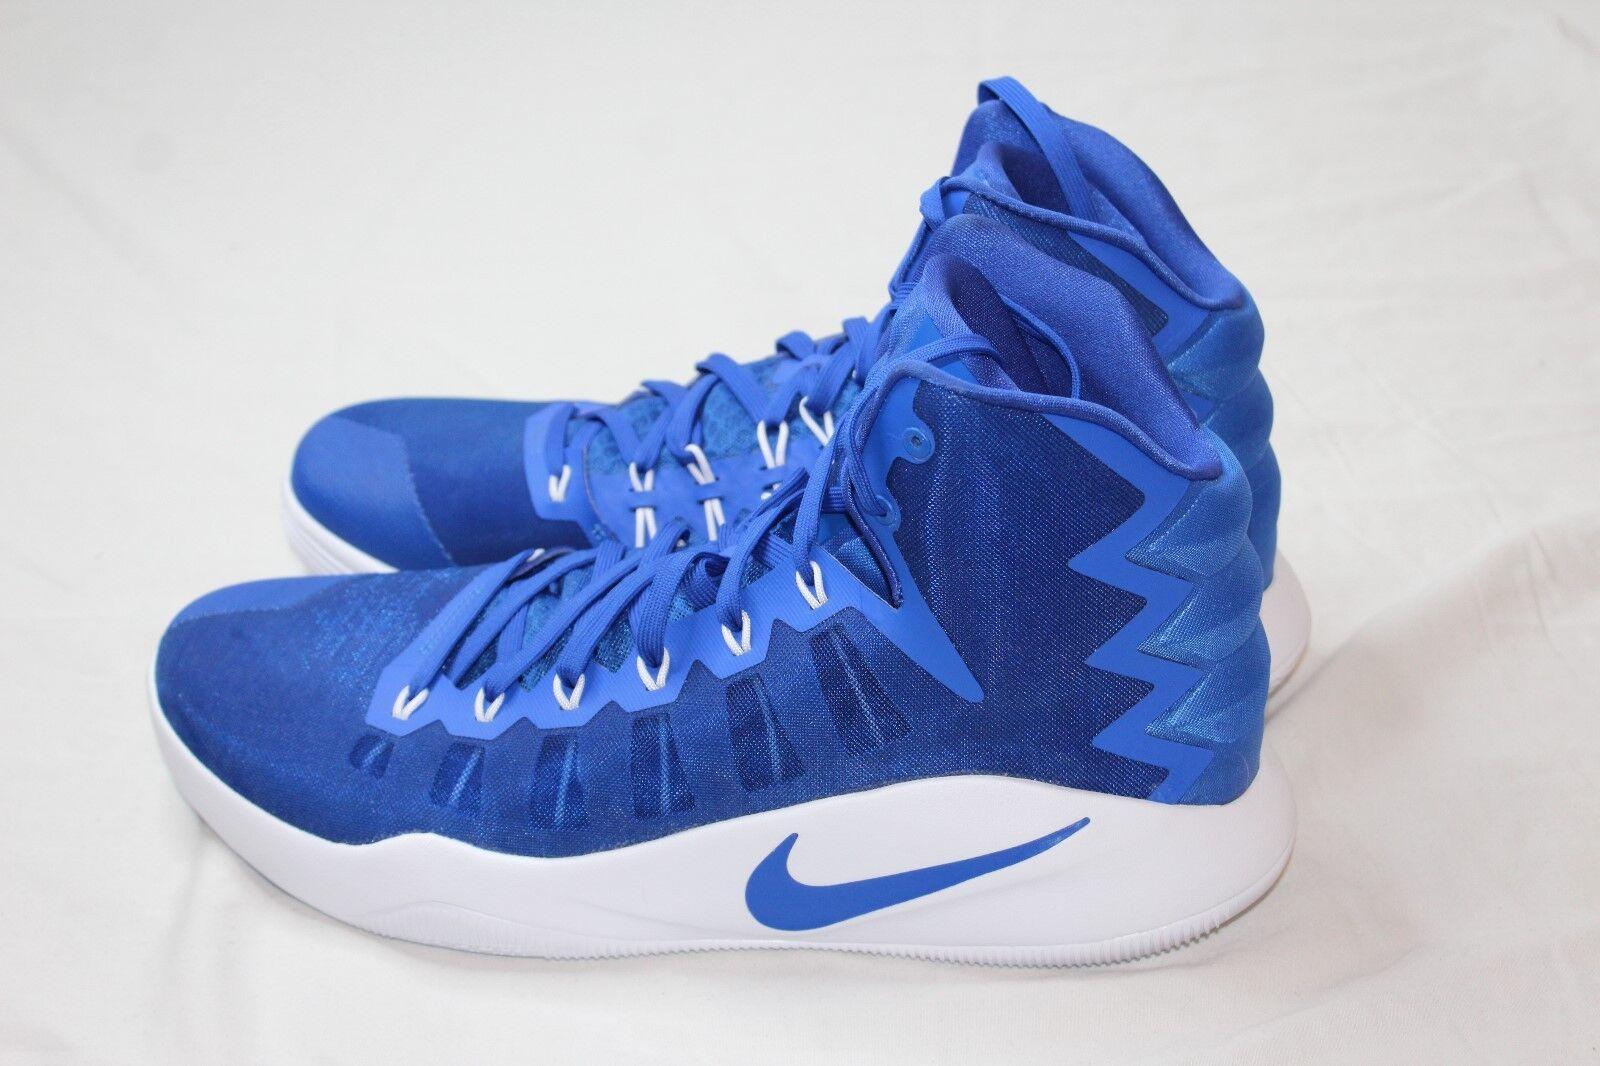 Nike Men's Hyperdunk High Top Basketball Shoes Royal Blue 856483-441 Size 15.5